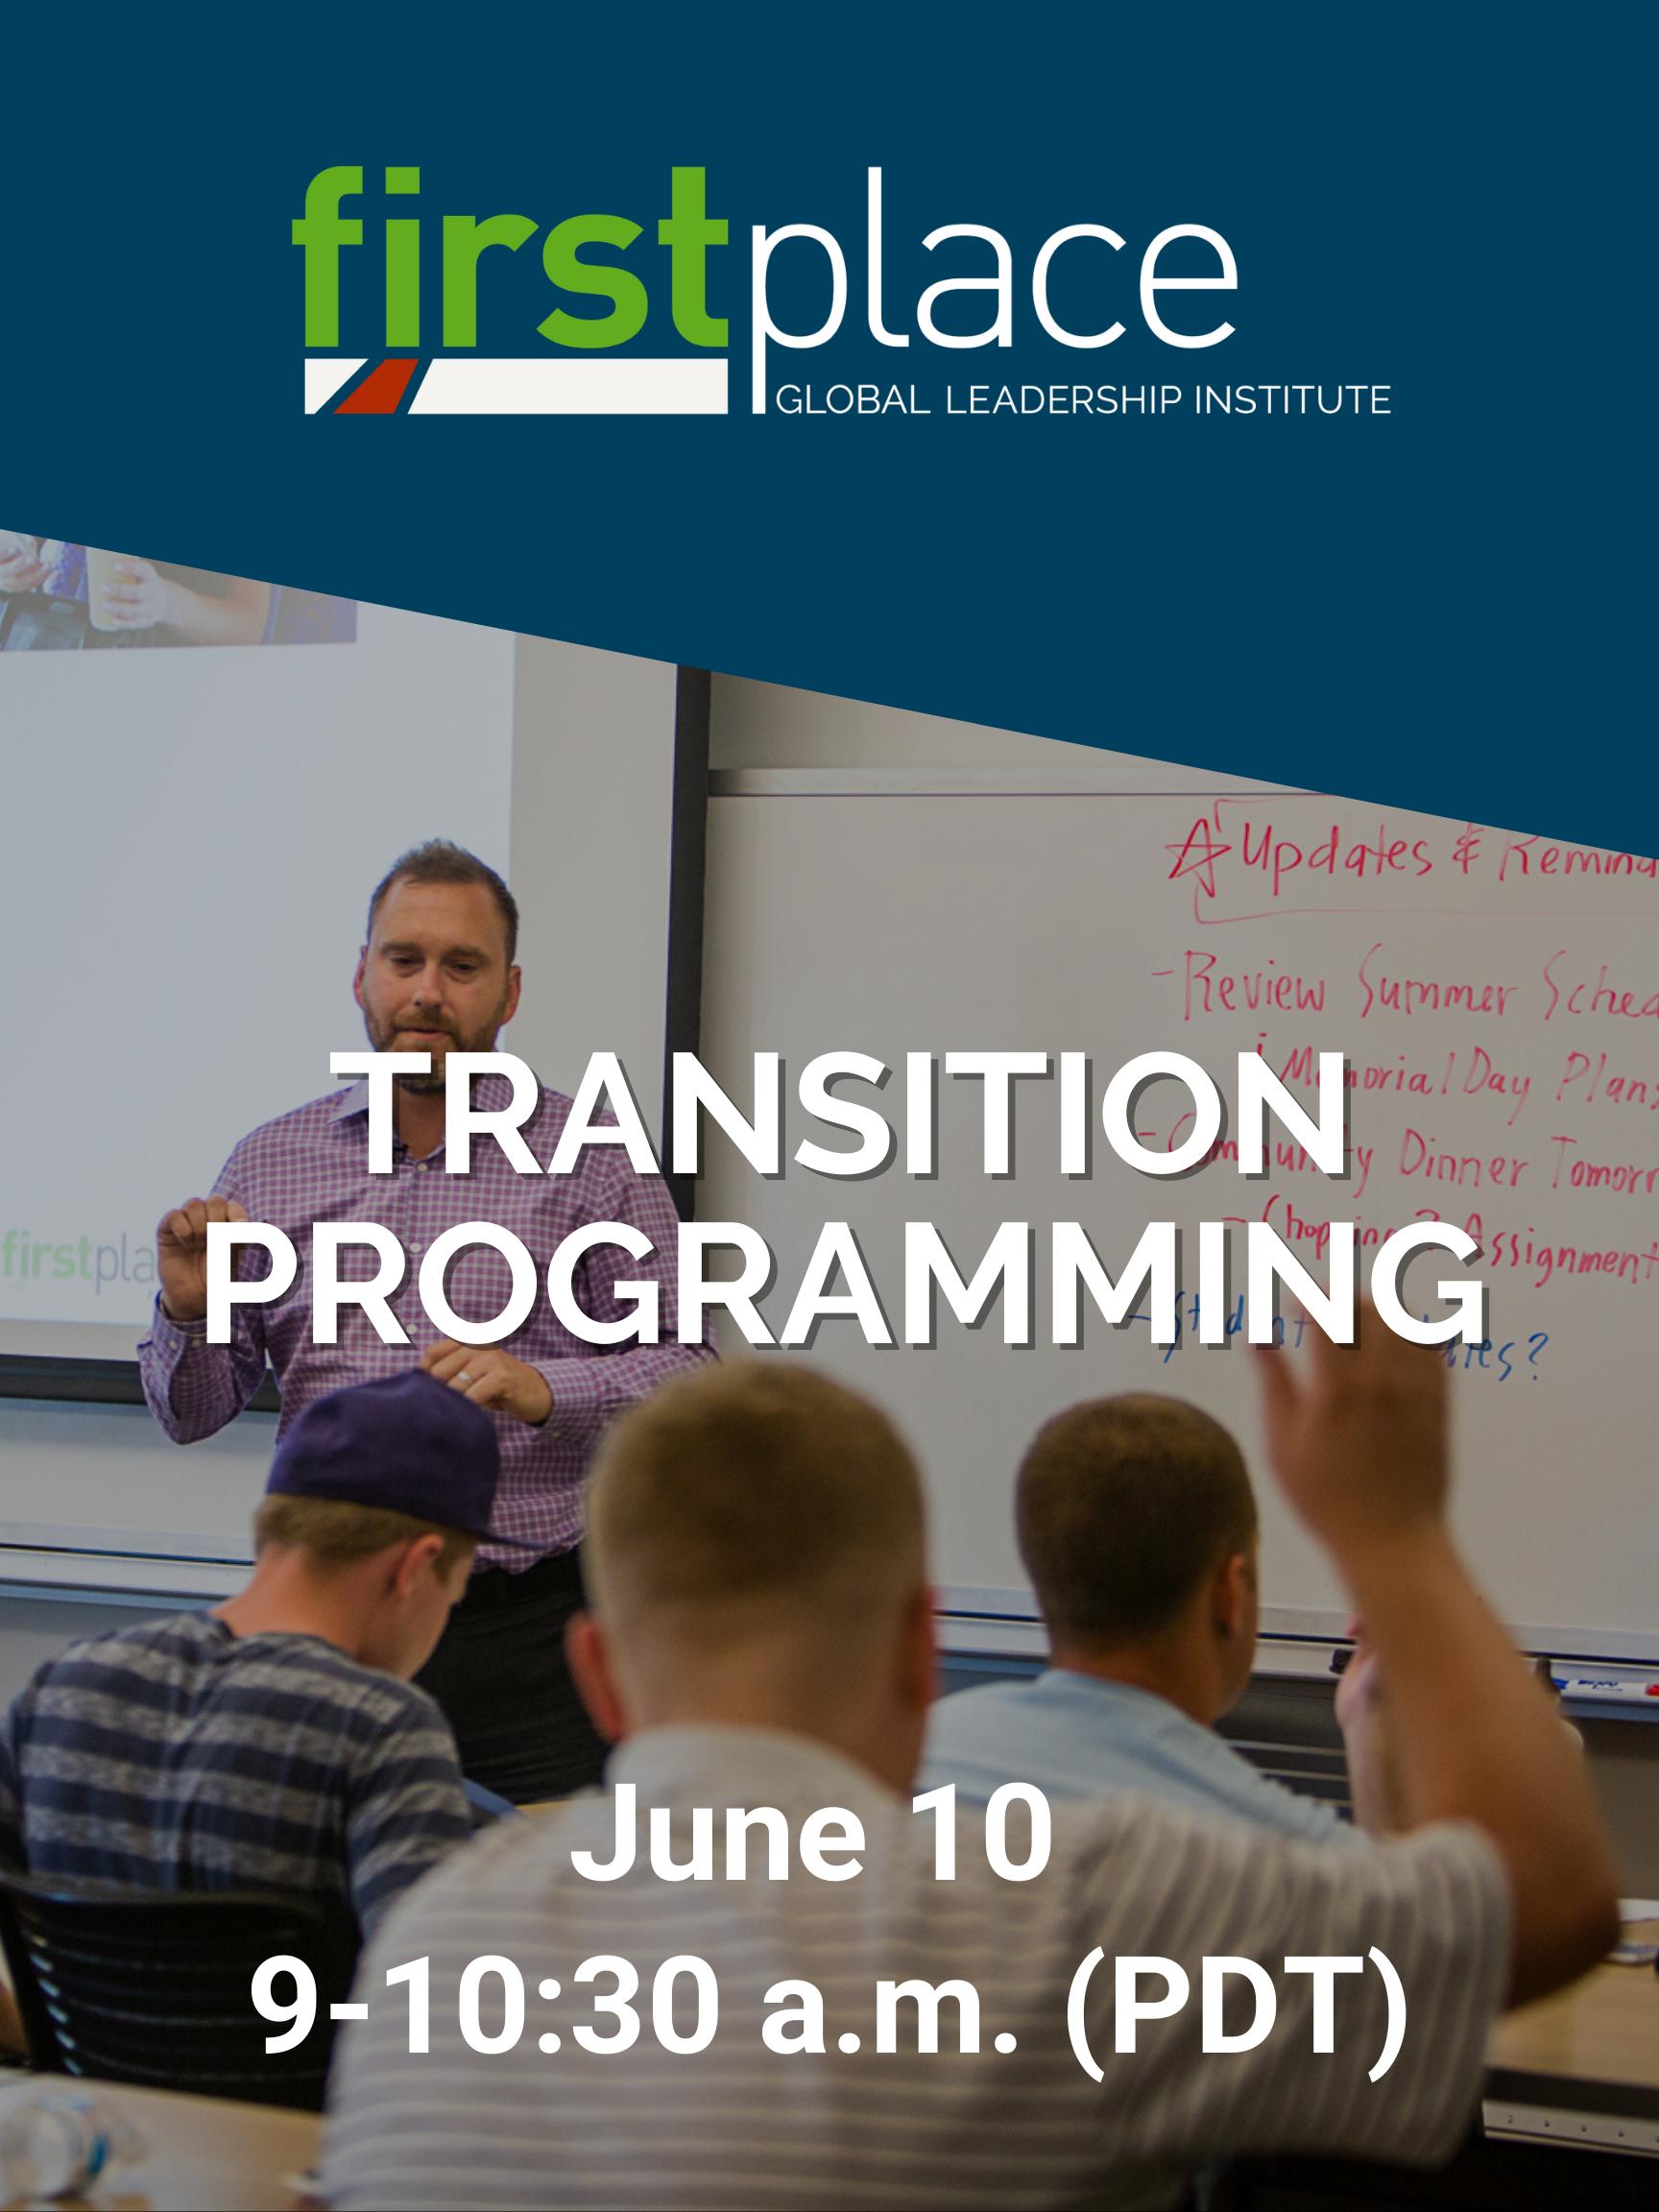 Transition Programming - June 10, 9 a.m. (PDT)